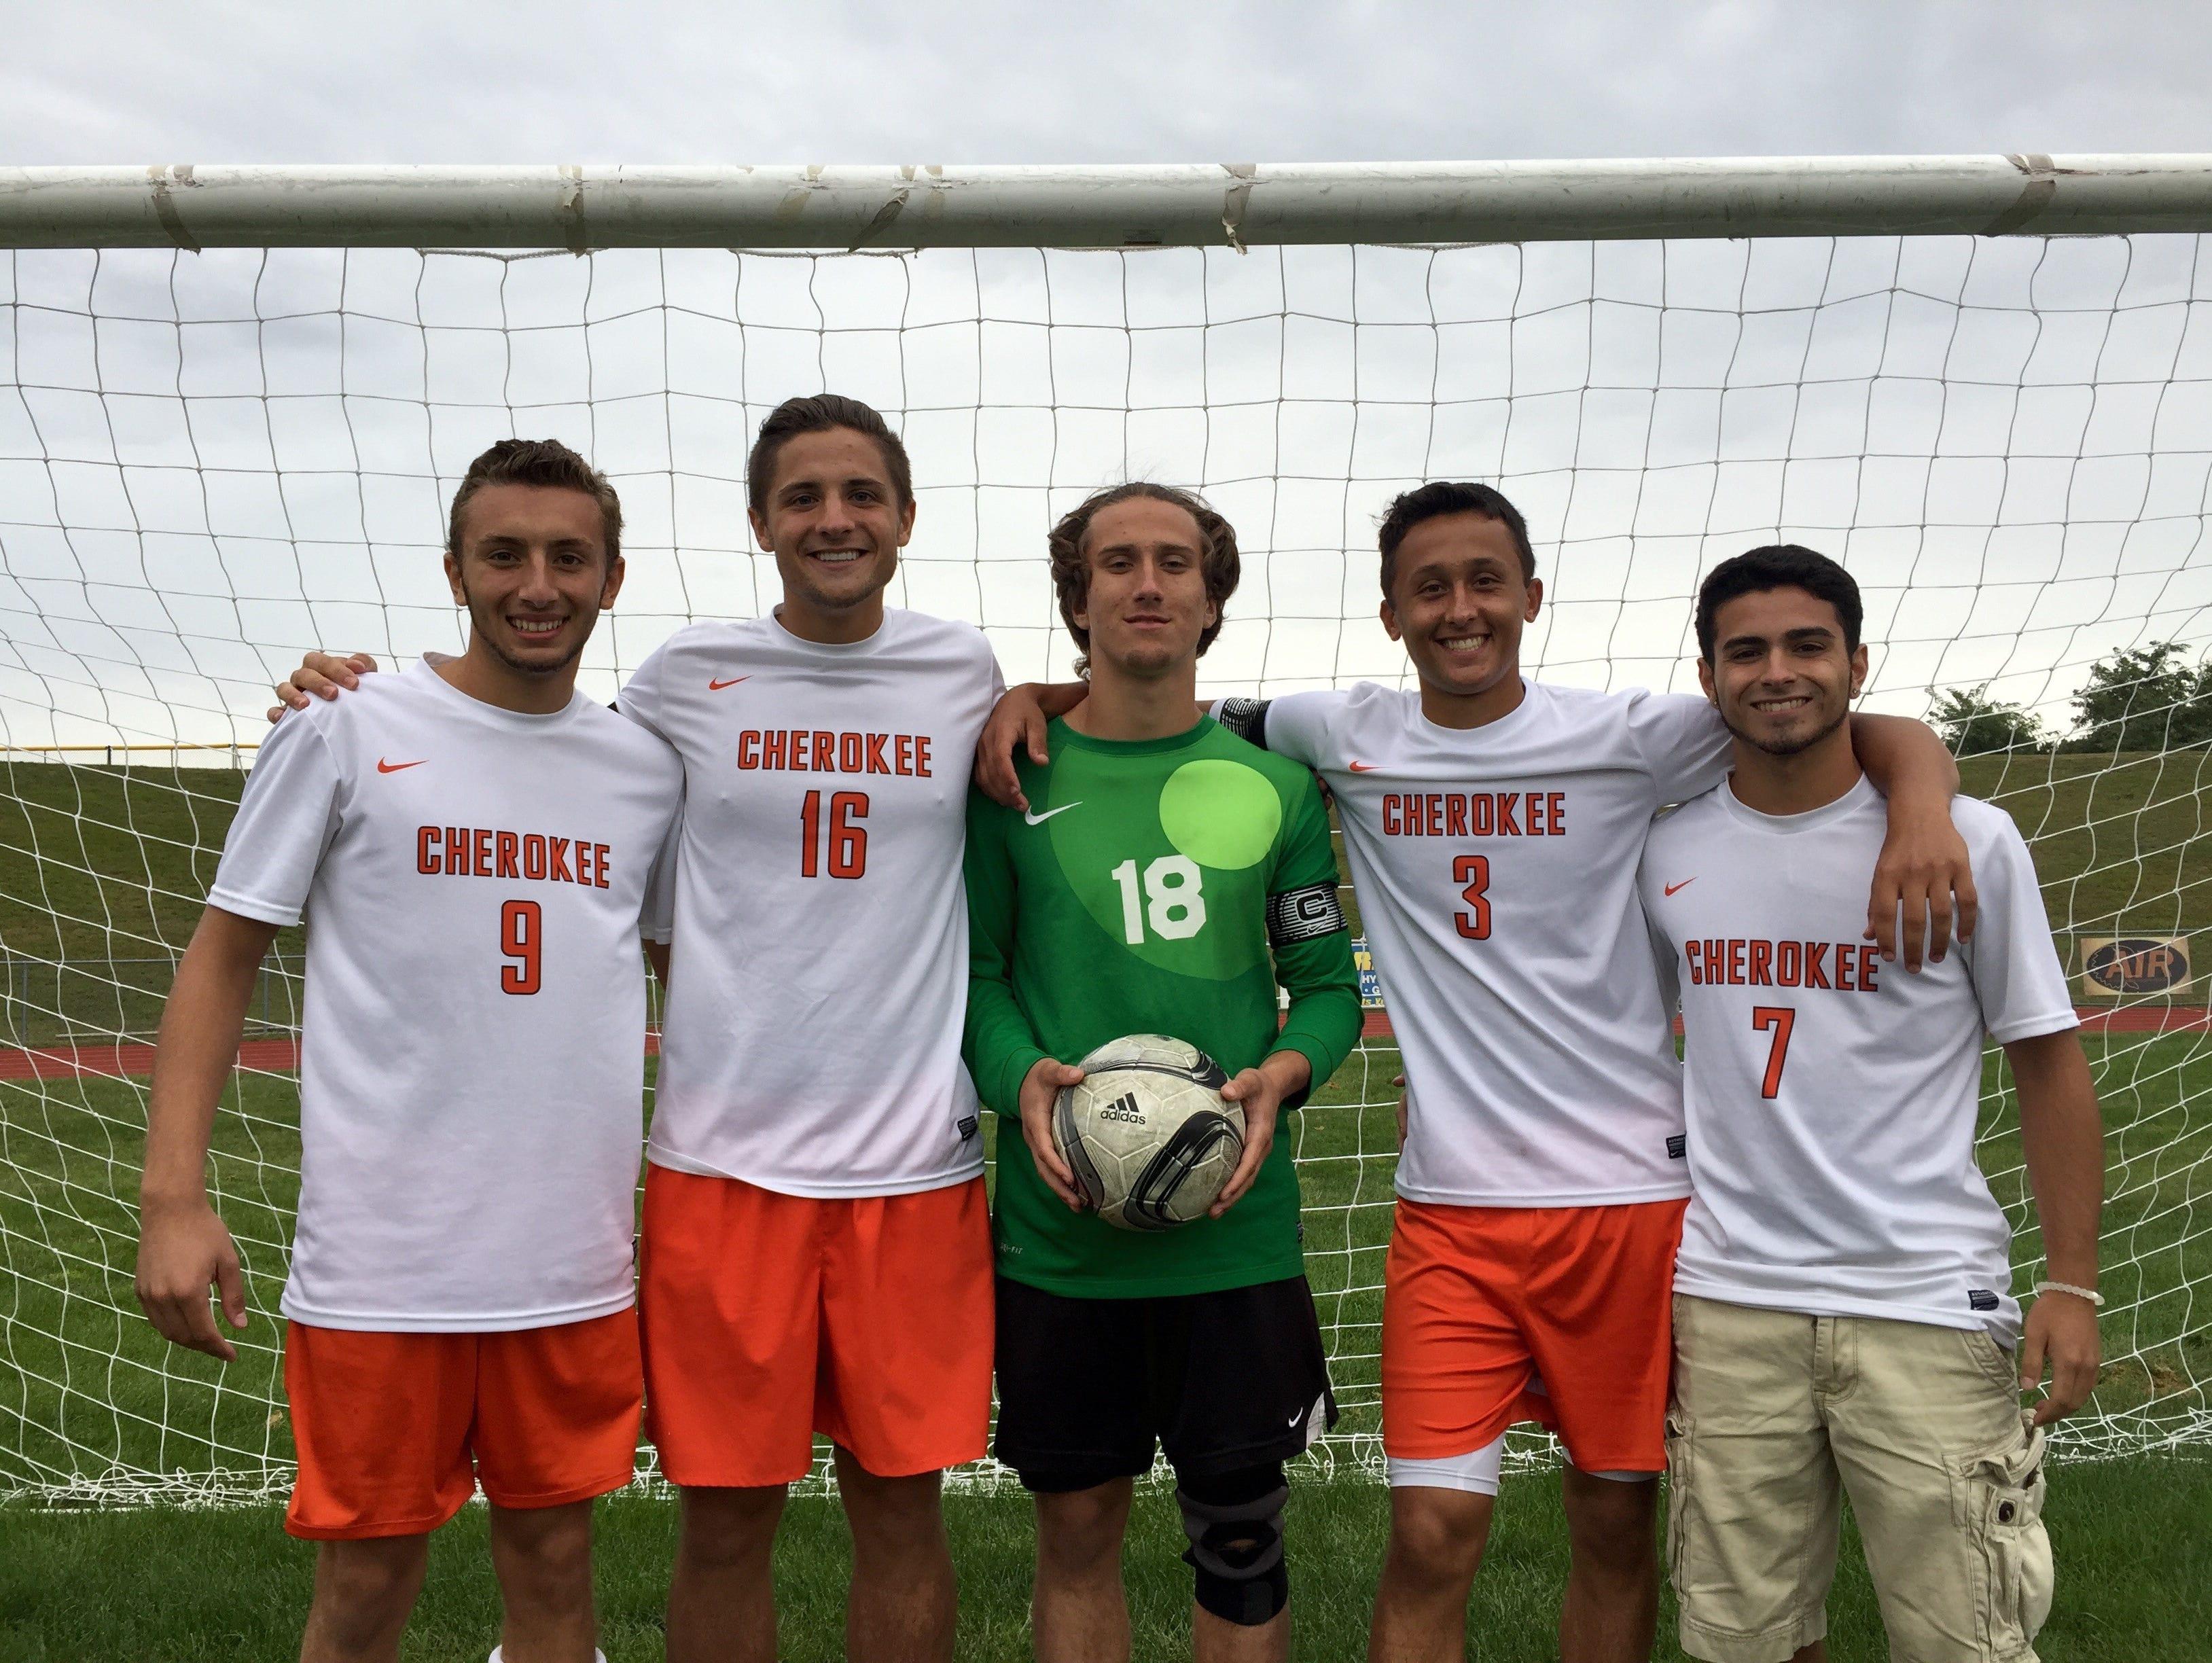 The Cherokee High School boys' soccer team seniors (L to R) Eamon McCarren, Mario LaMorte, Zach Rowe, Cristian Ognibene, Justin McCarthy